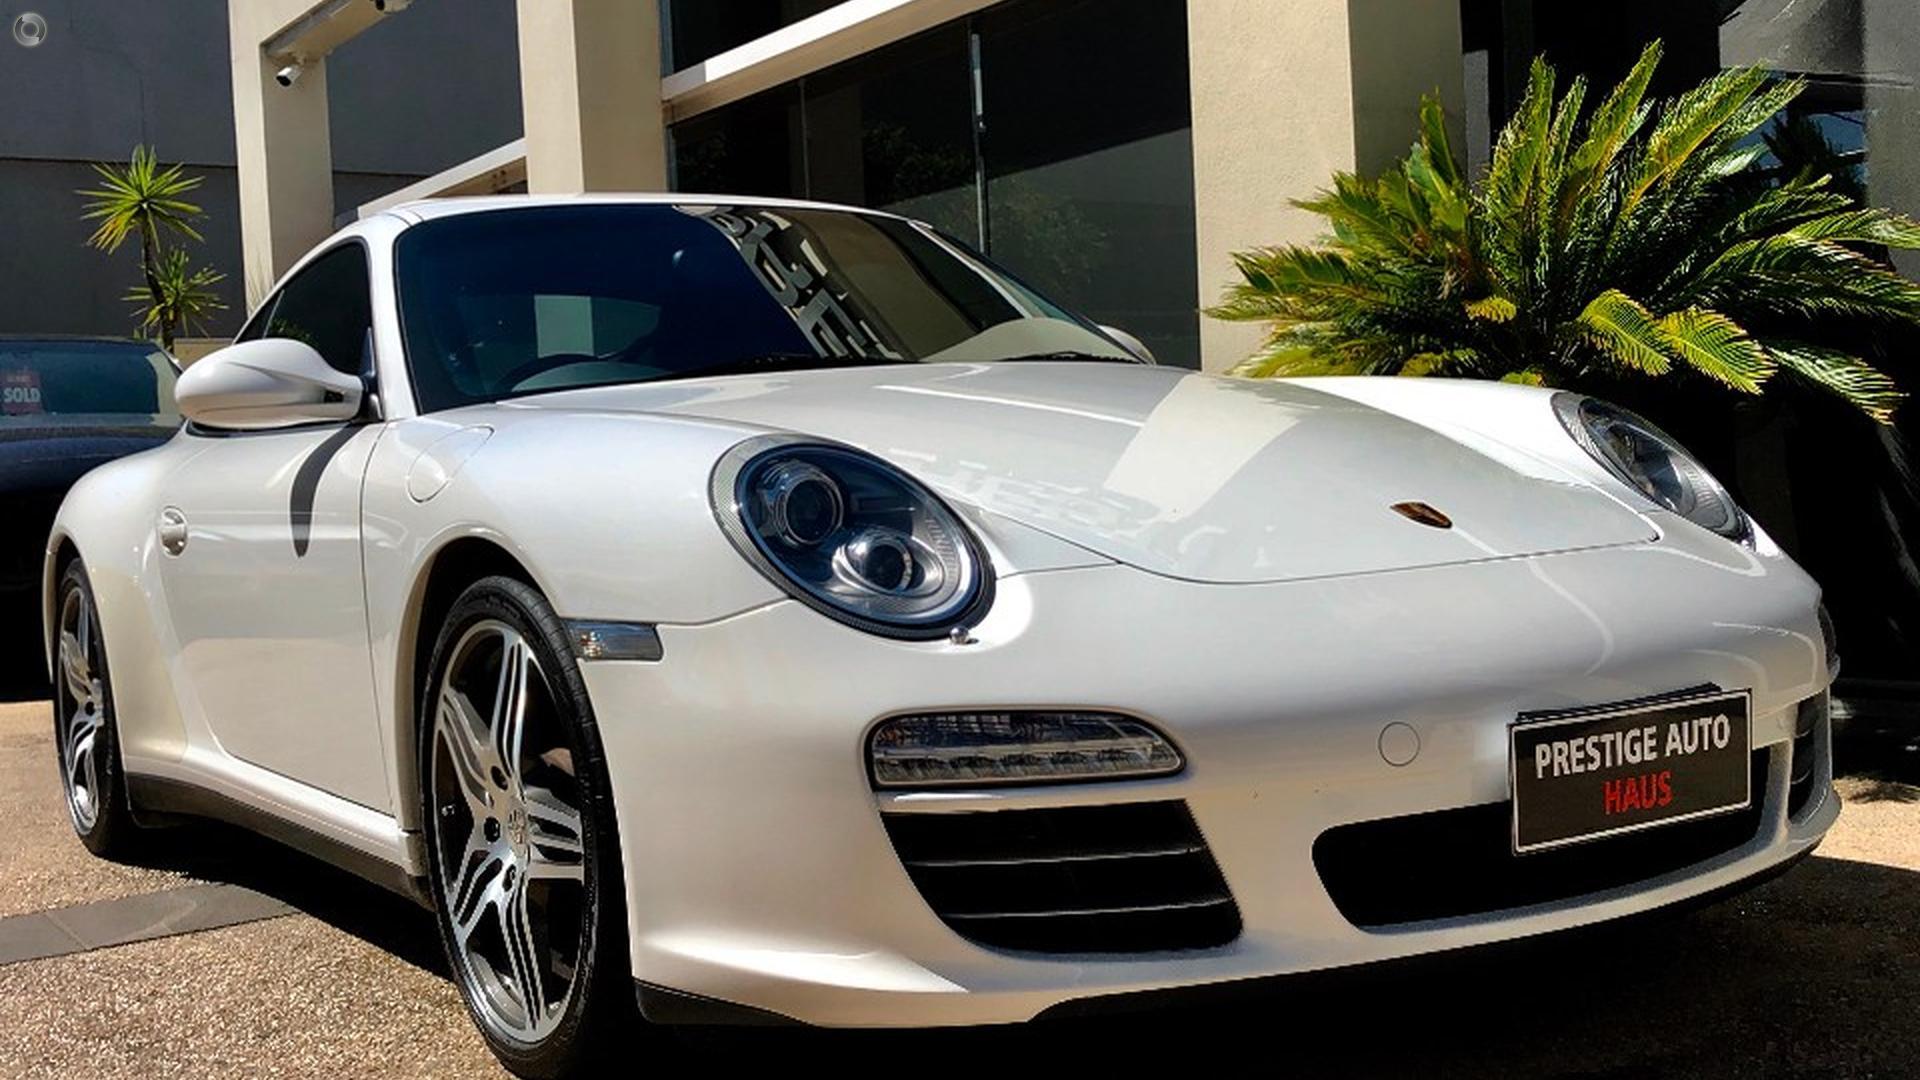 2008 Porsche 911 997 Series II